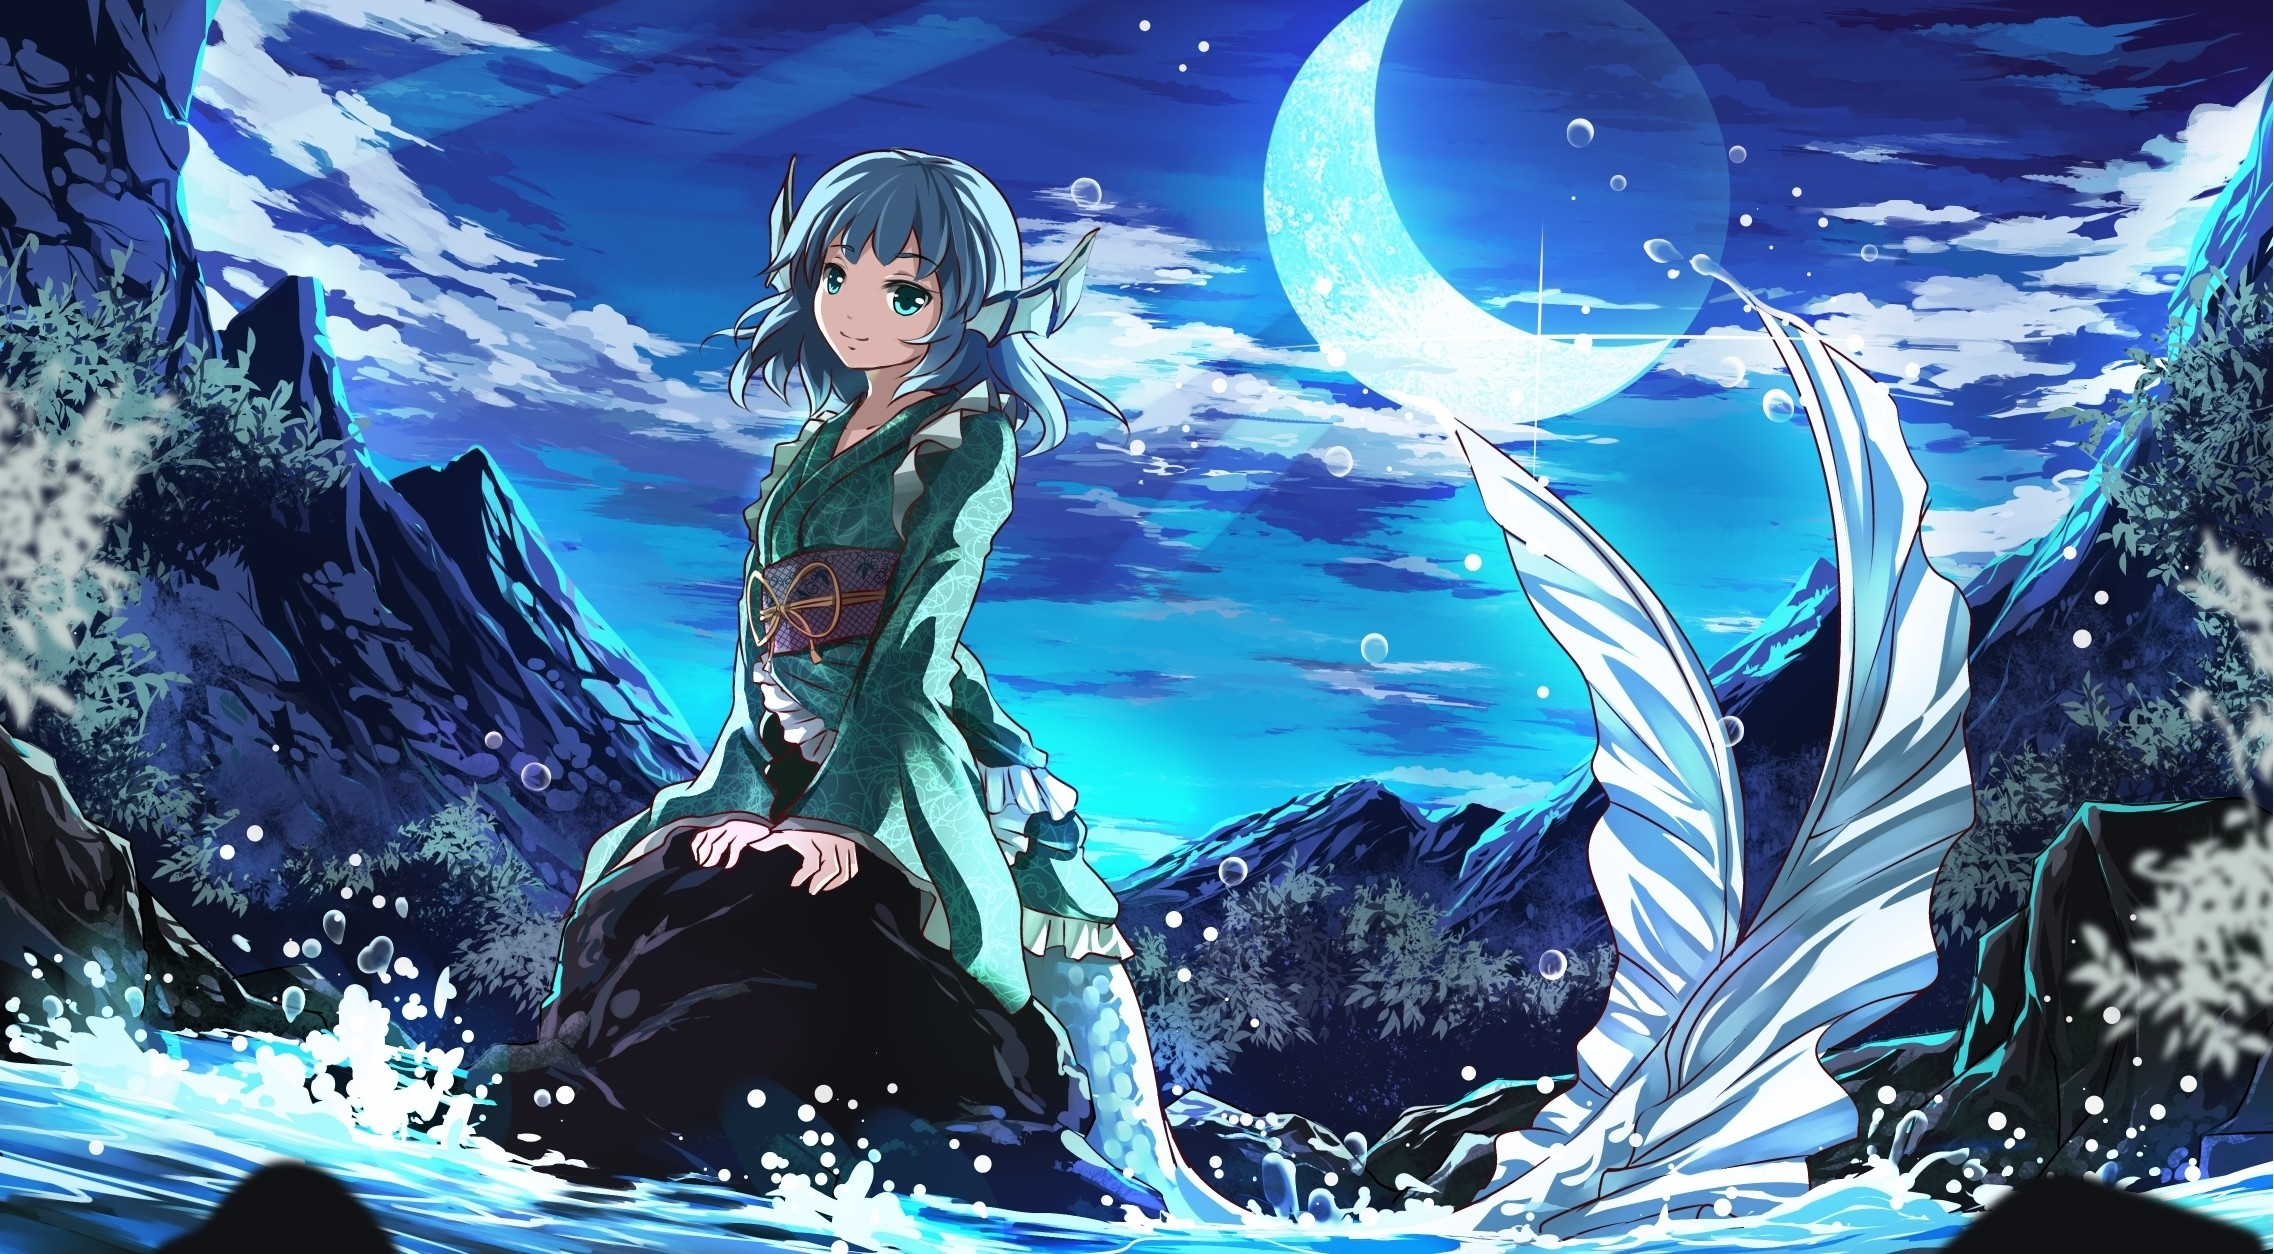 Photos Mermaid Anime Girls Fantasy Tail Moon 2274×1254